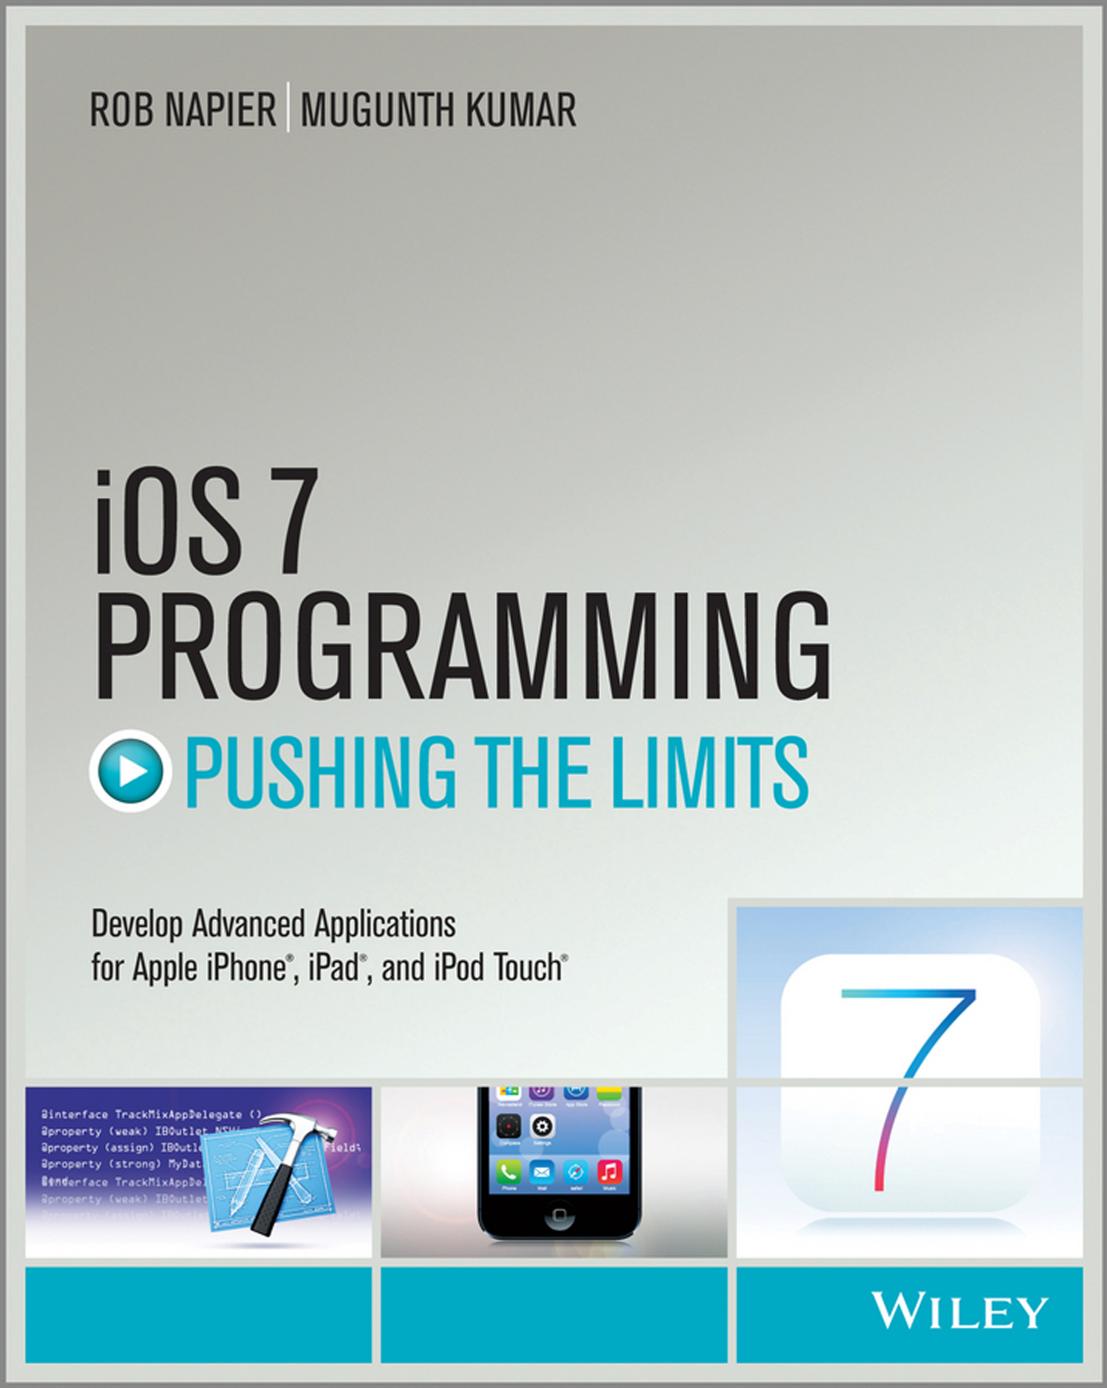 iOS 7 Programming Pushing the Limits | manualzz com